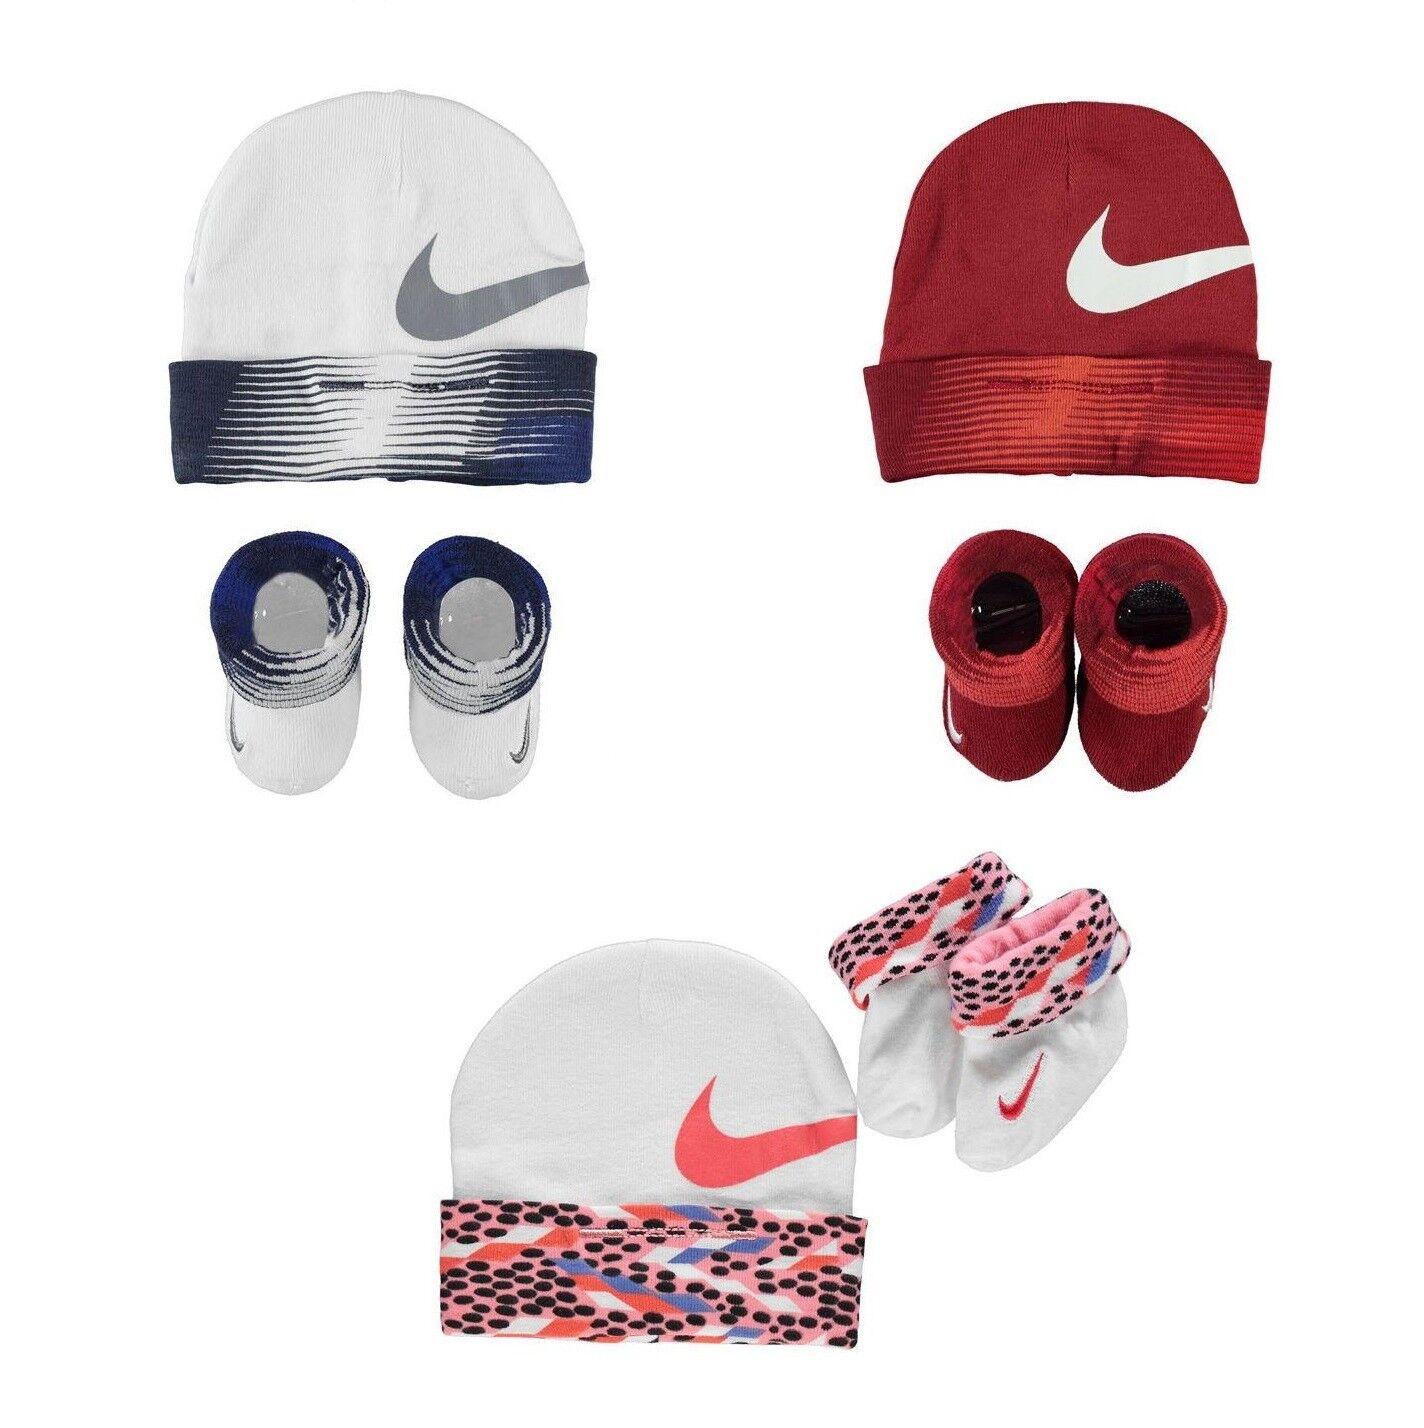 Nike Baby Socken Mütze Set 2 Teile  Neugeborene 0-6 Monate